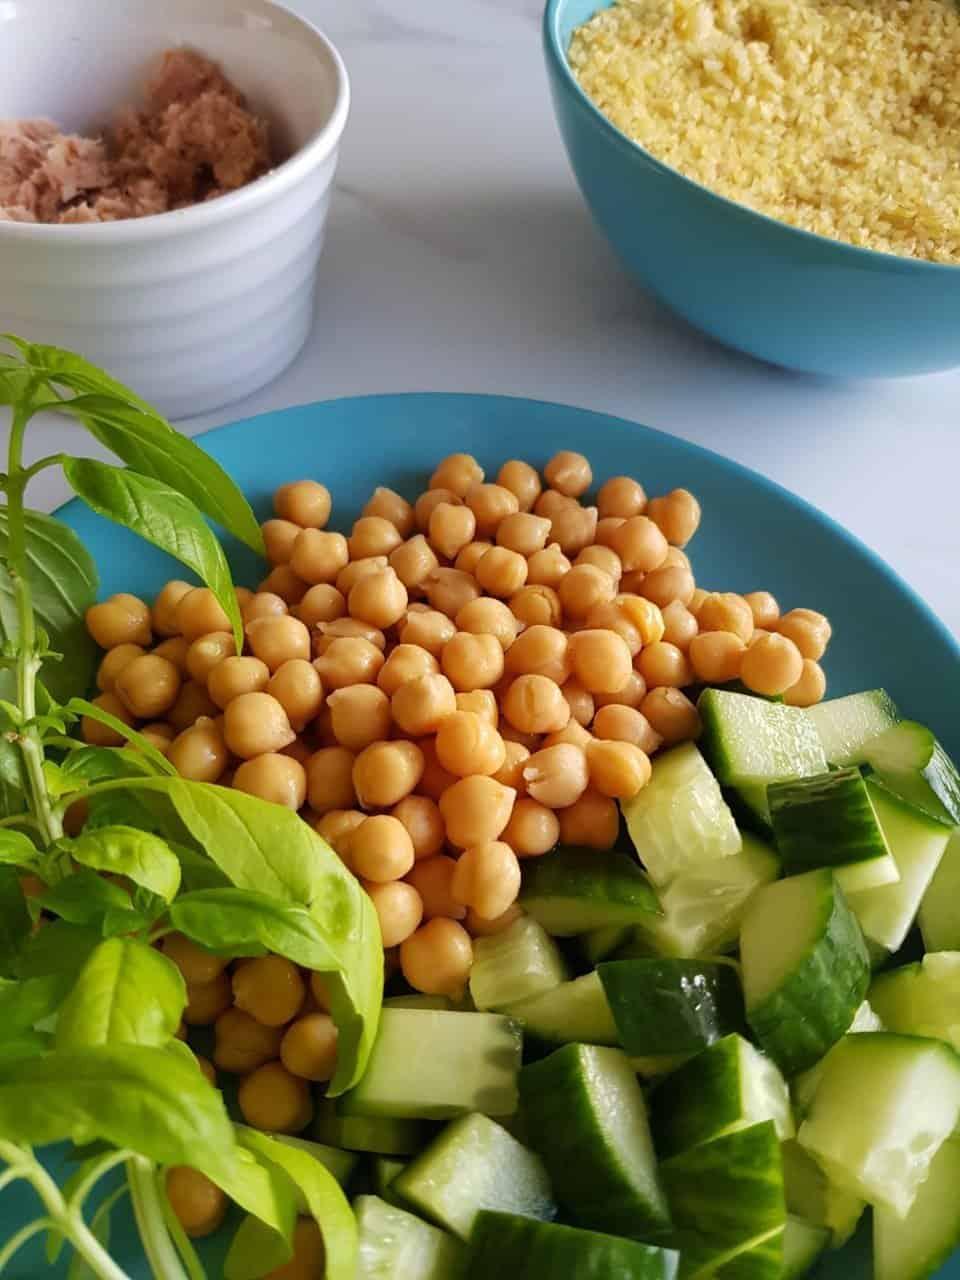 All ingredients needed to make a tuna bulgur salad.